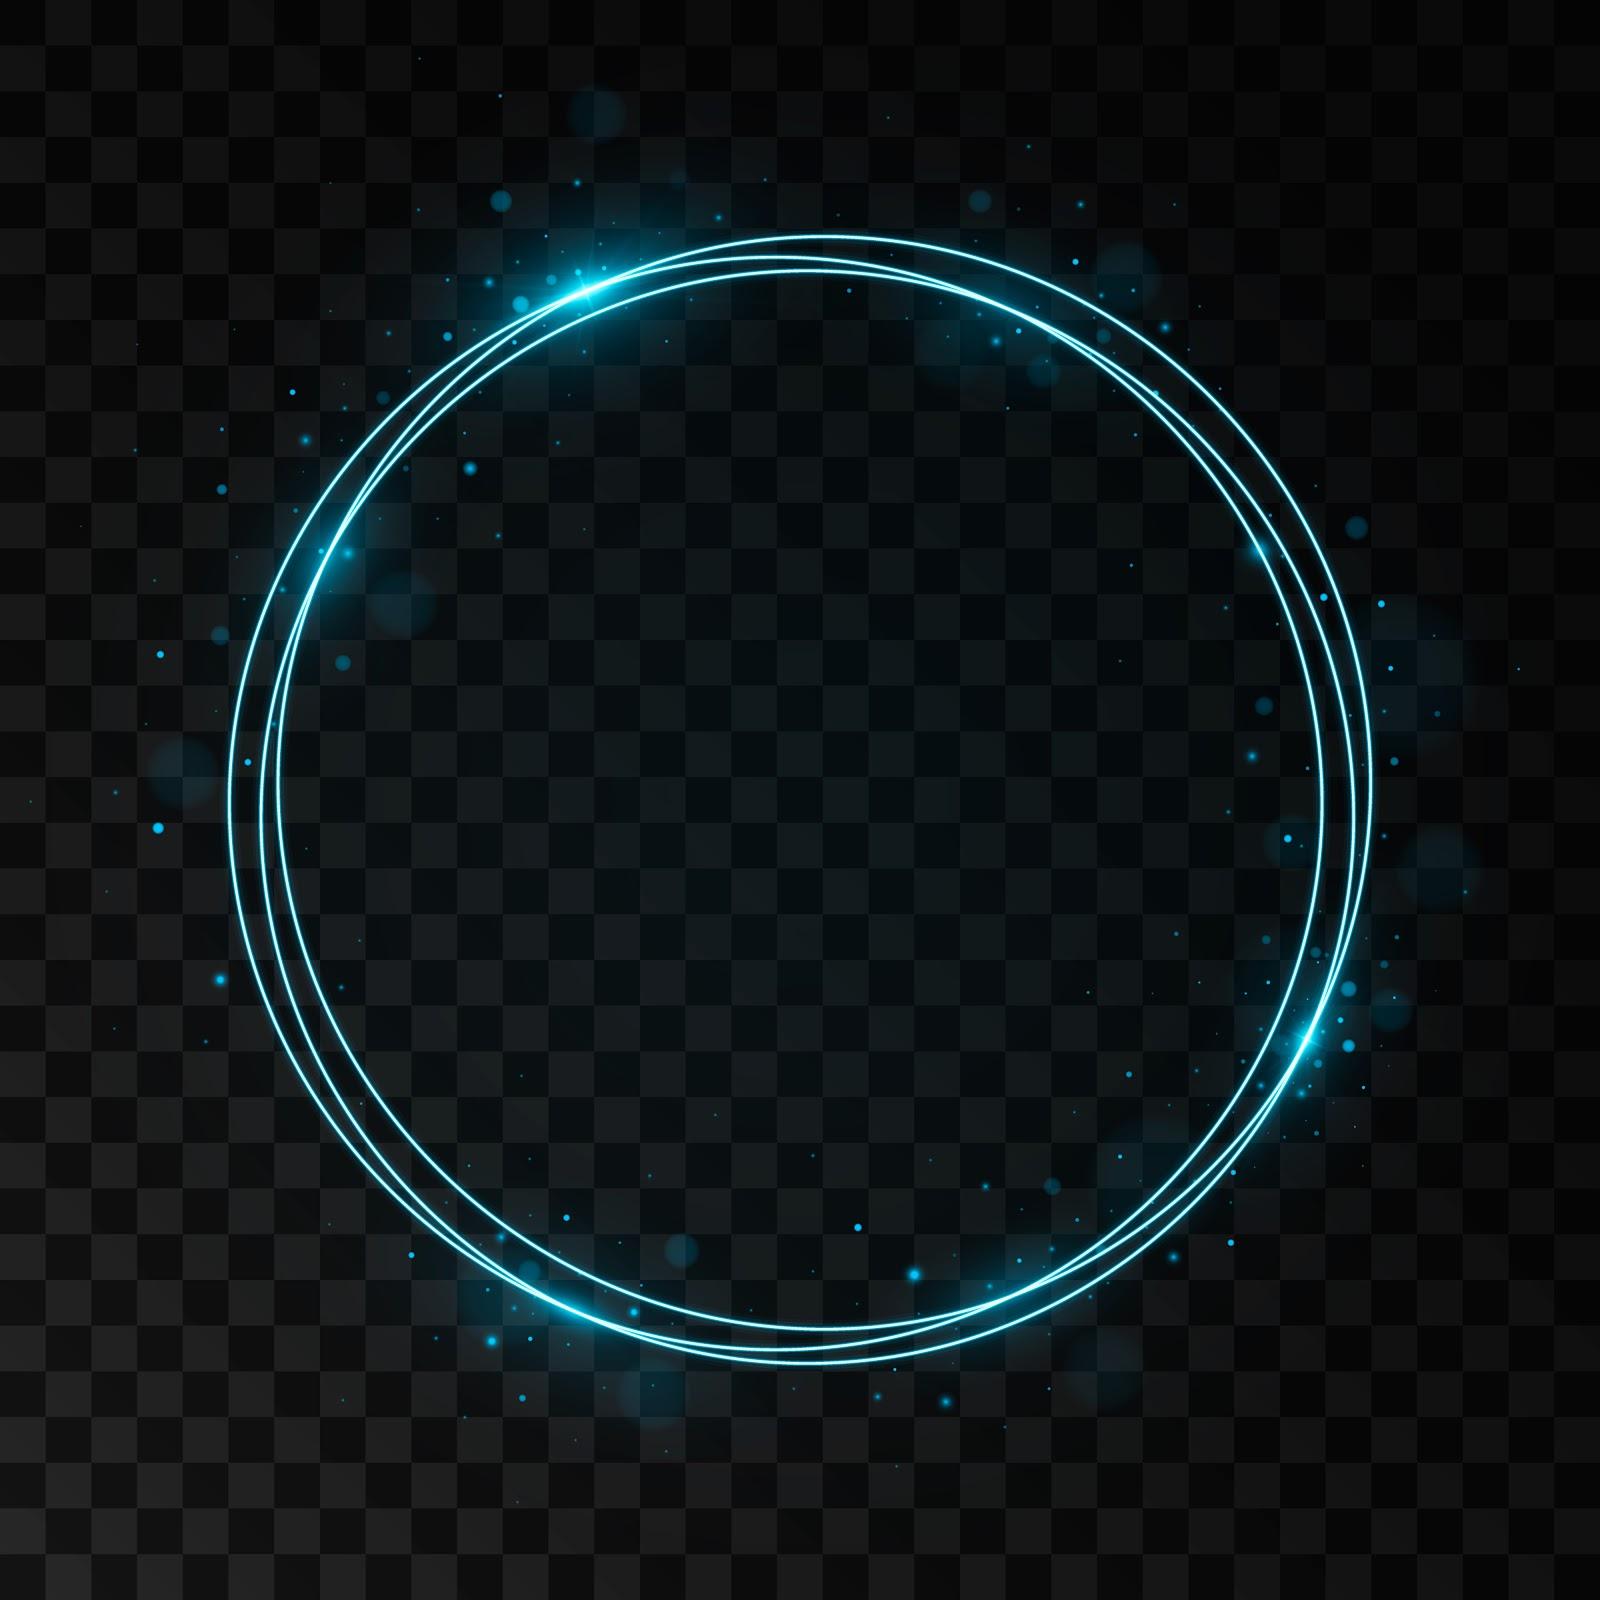 Blue-neon-circle-on-black-background